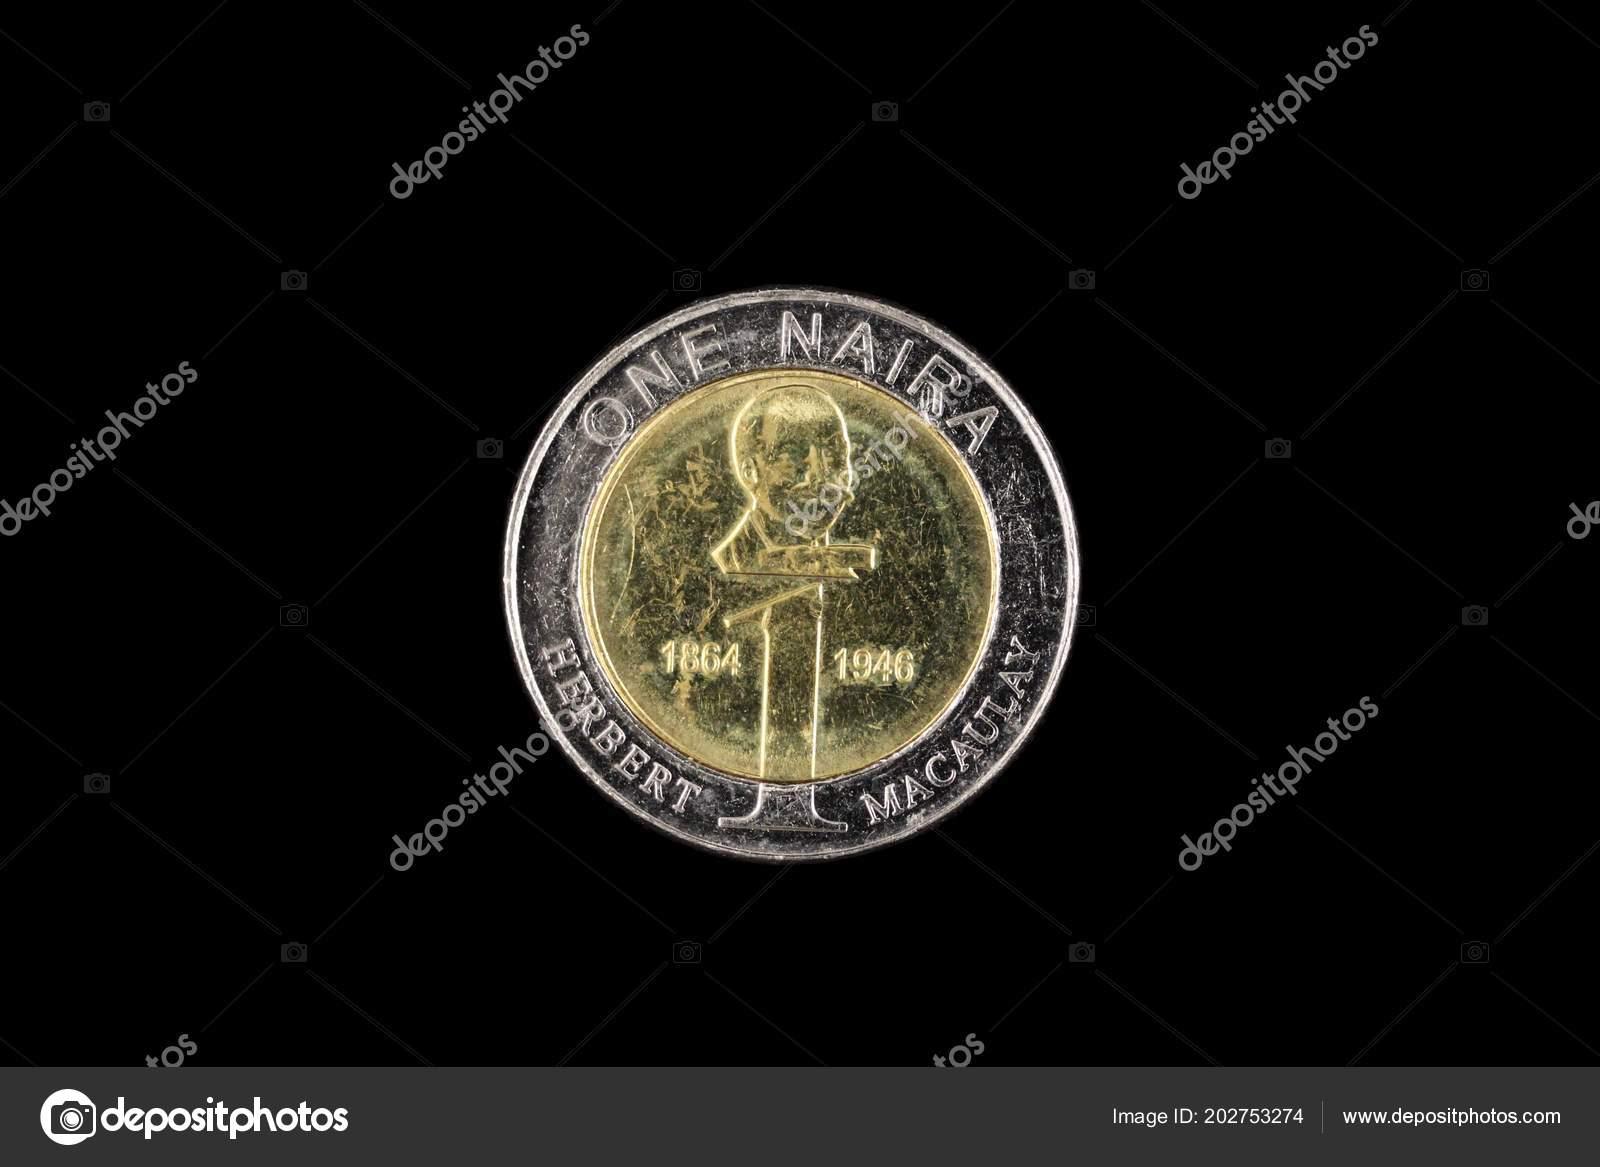 Close Image Nigerian Bimettalic One Naira Coin Isolated